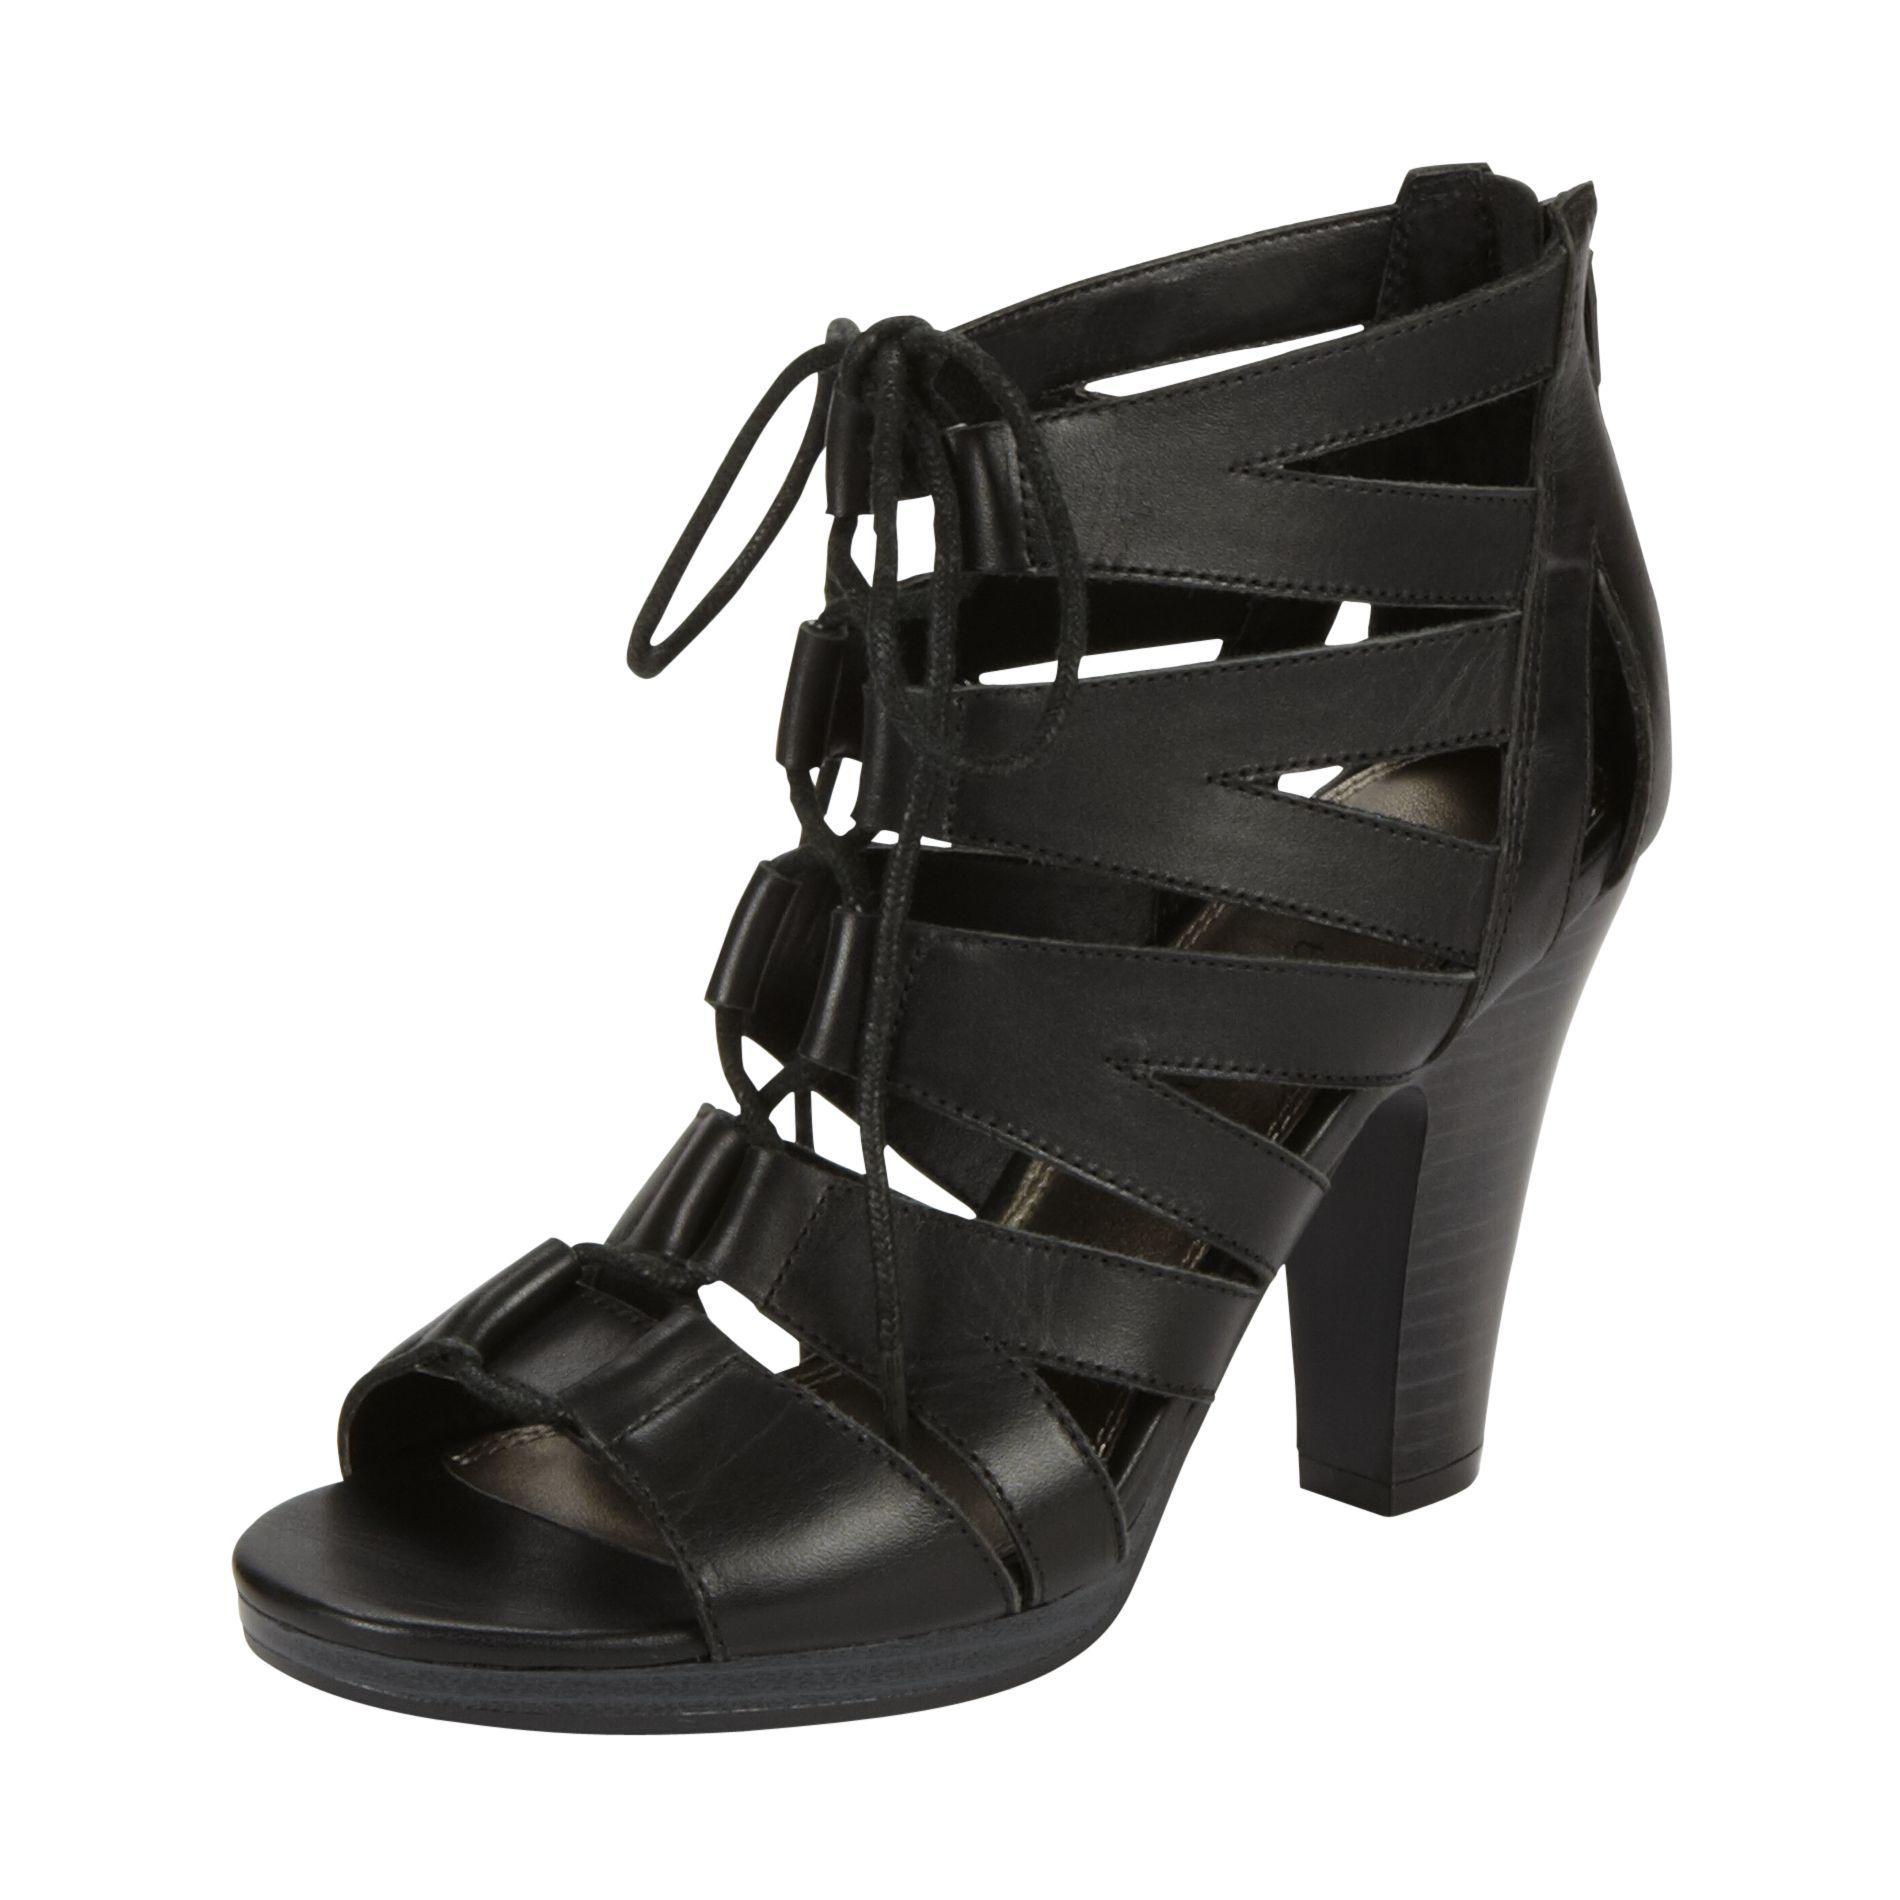 Womens sandals kmart - Women S Dress Shoe Gilligan Black 39 99 Kmart